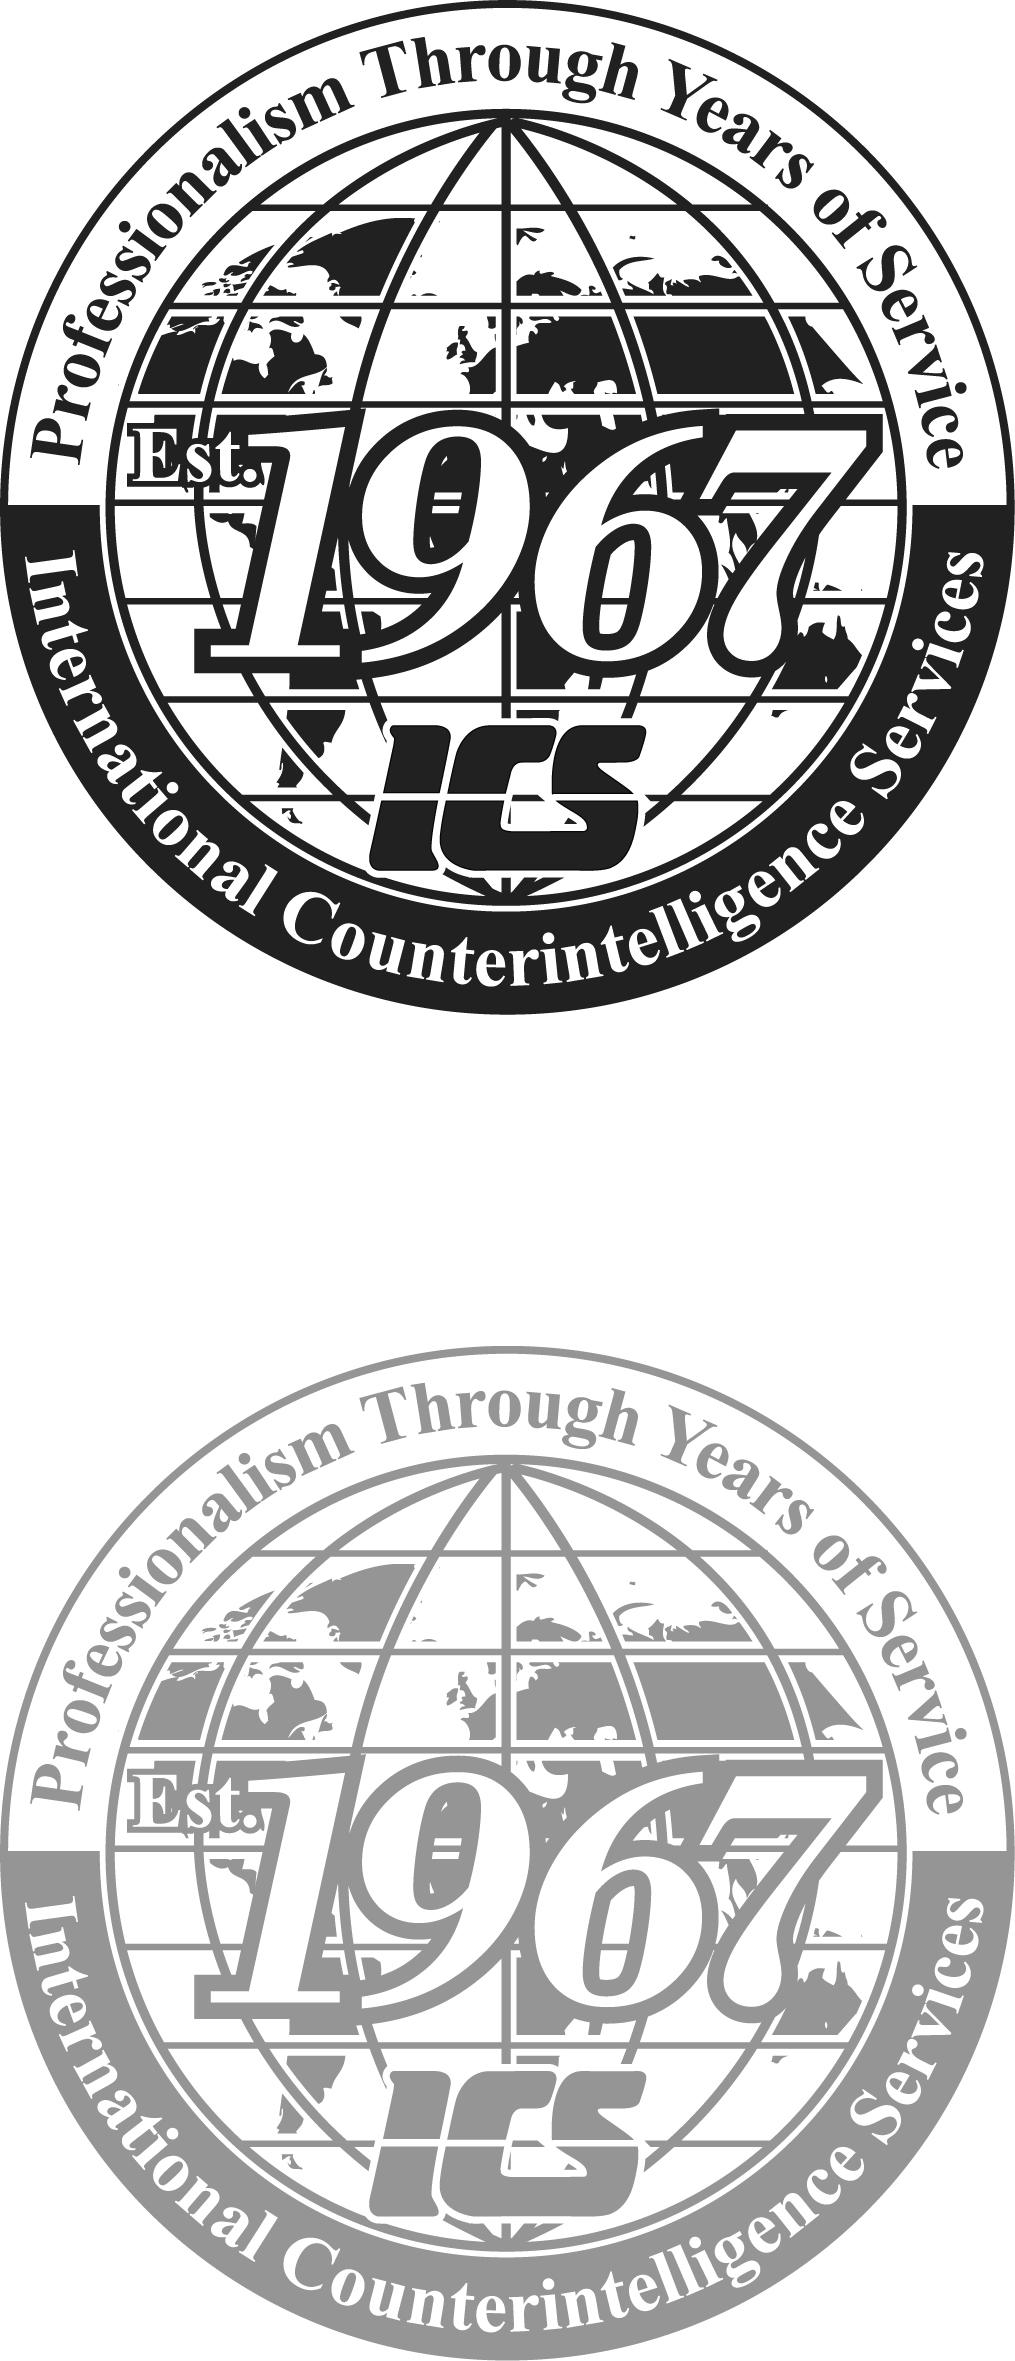 ICS of Colorado, LLC image 2